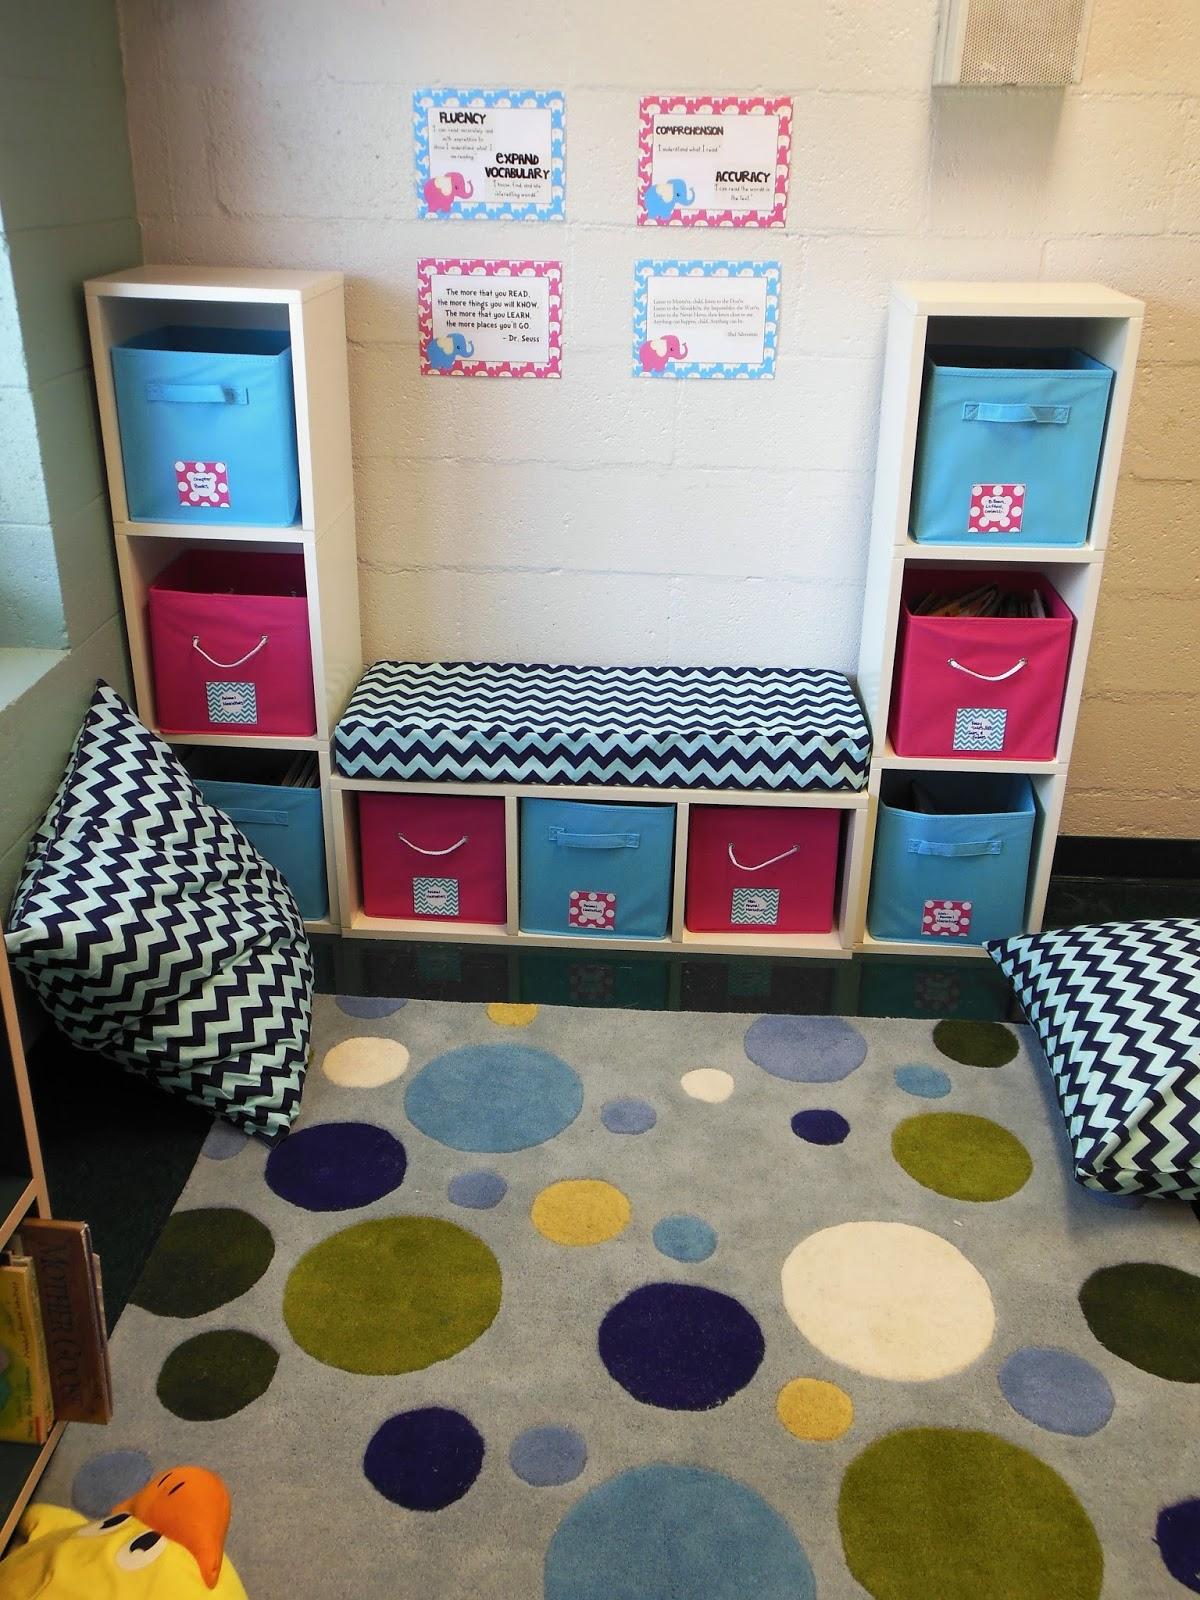 Classroom Decor Grade 1 : Busy with the cricky first grade classroom decor so